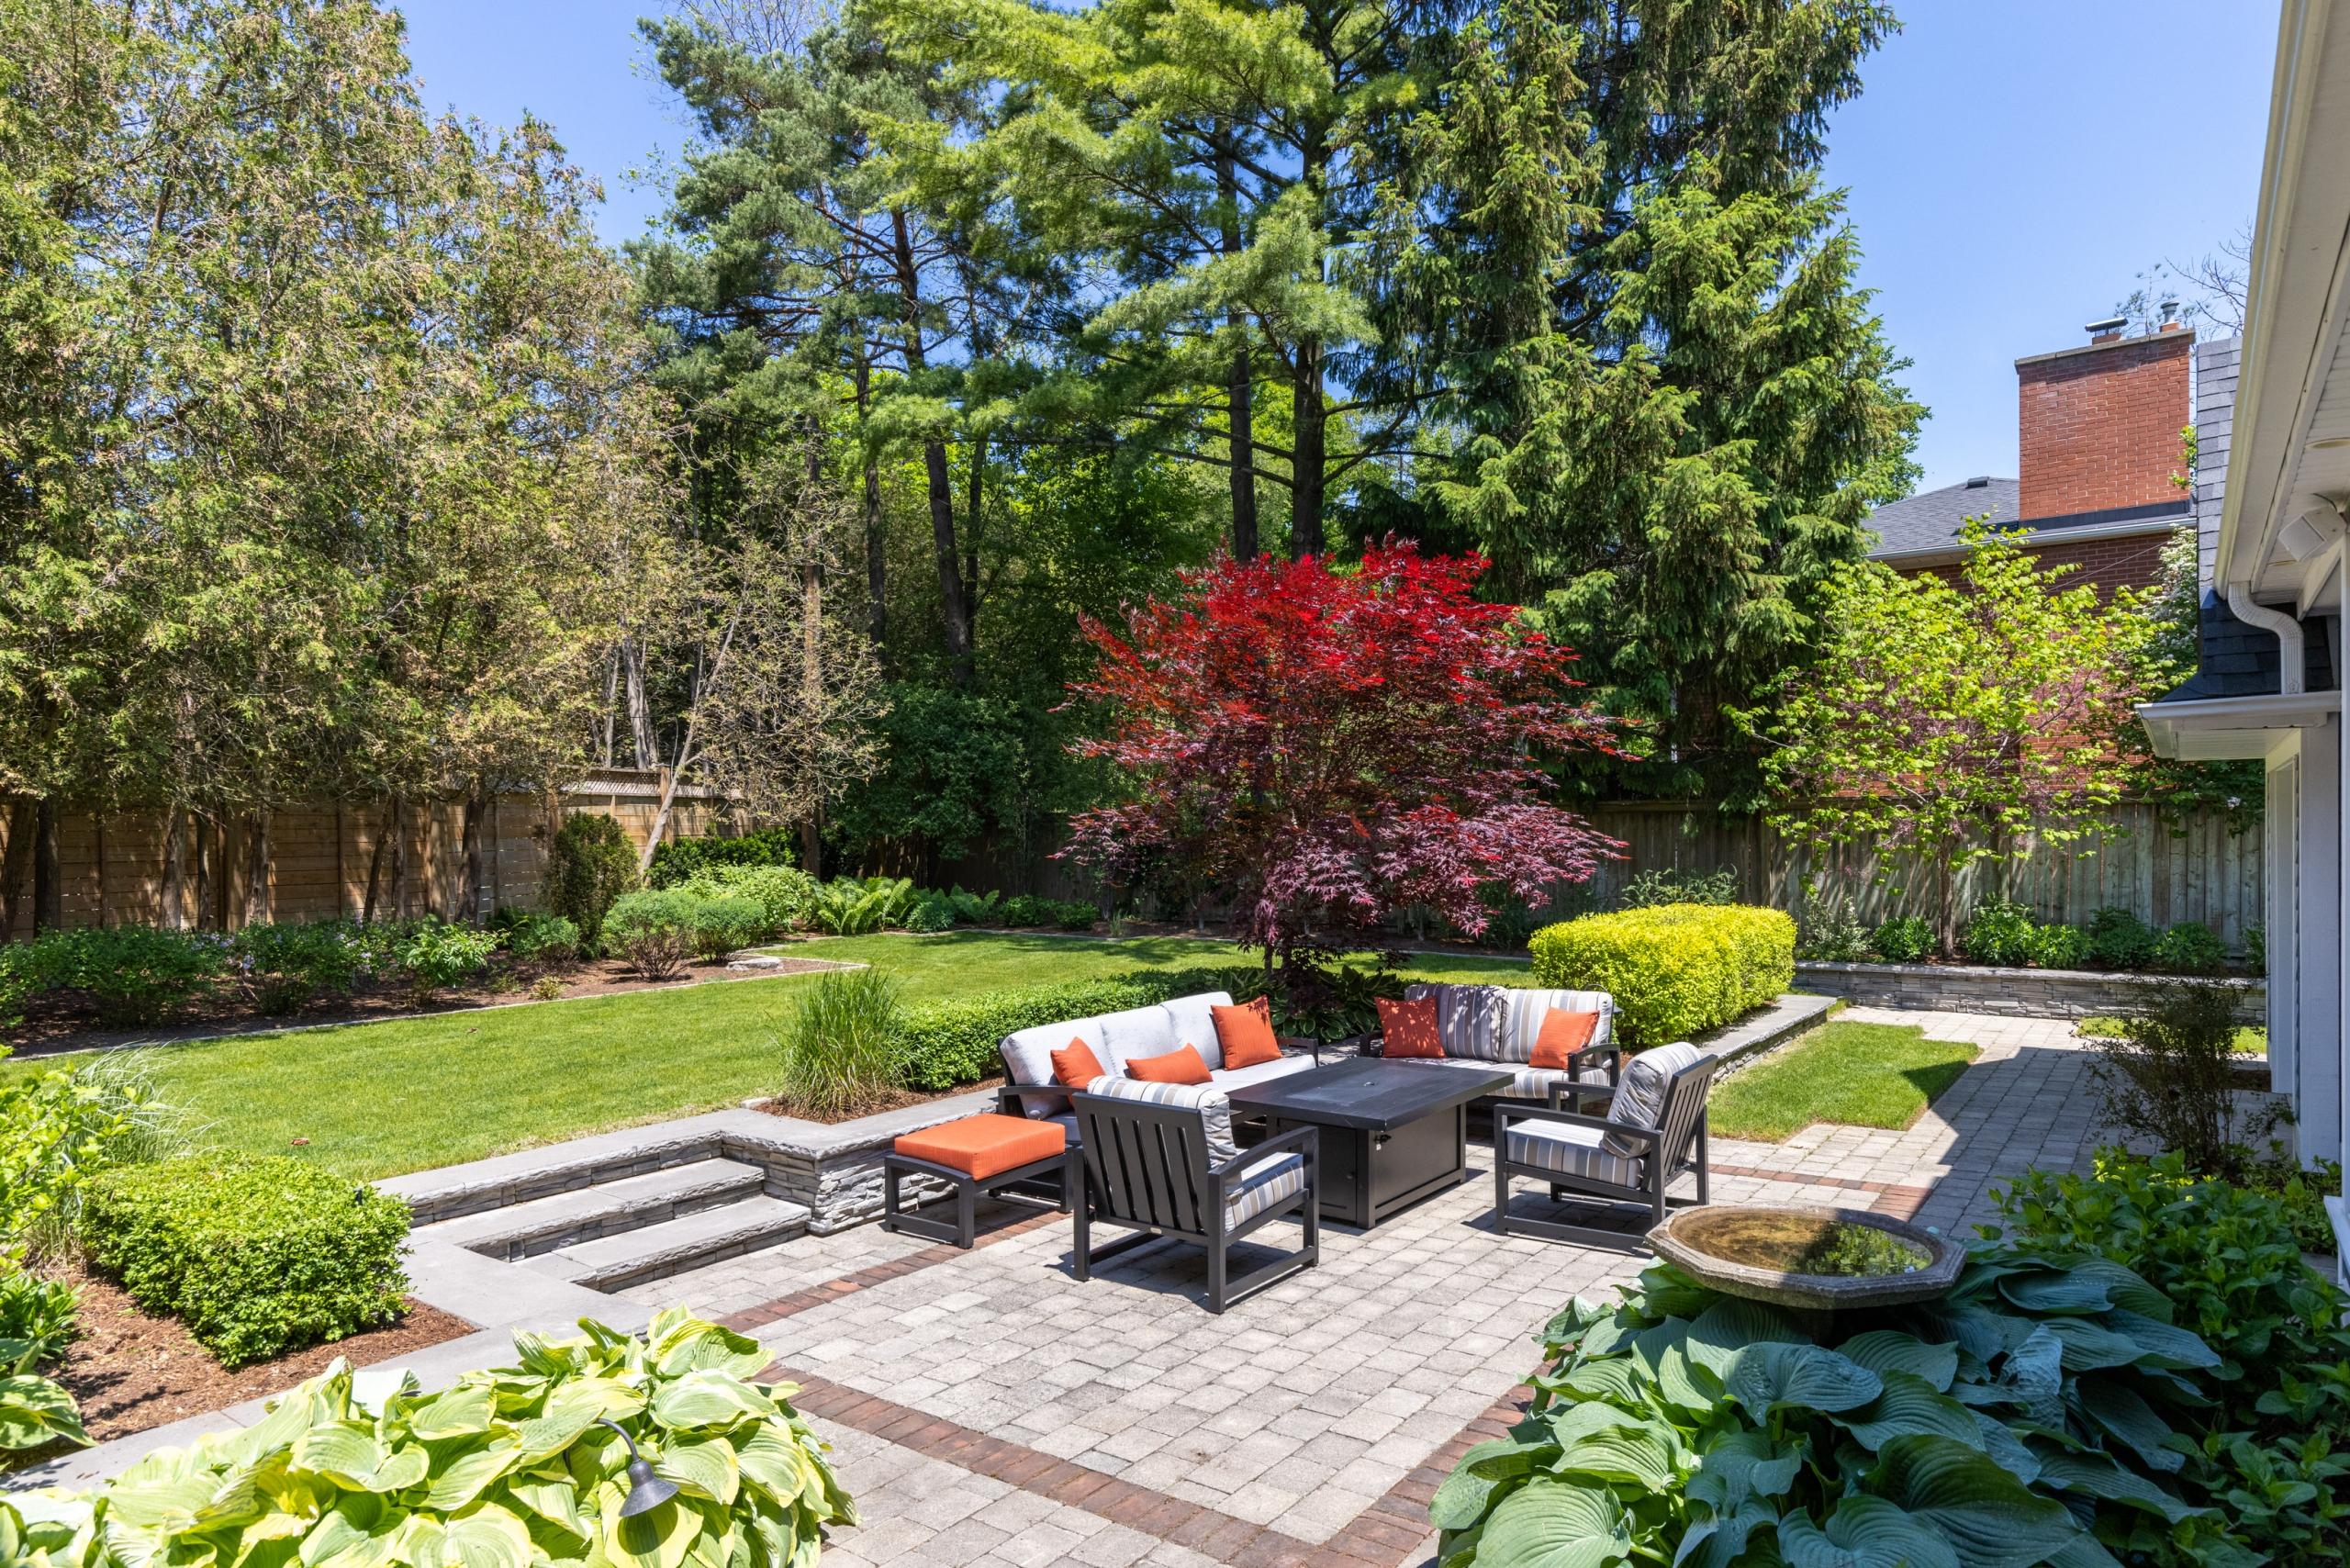 front garden featured at 1109 Morrison Heights Drive, Oakville at Alex Irish & Associates